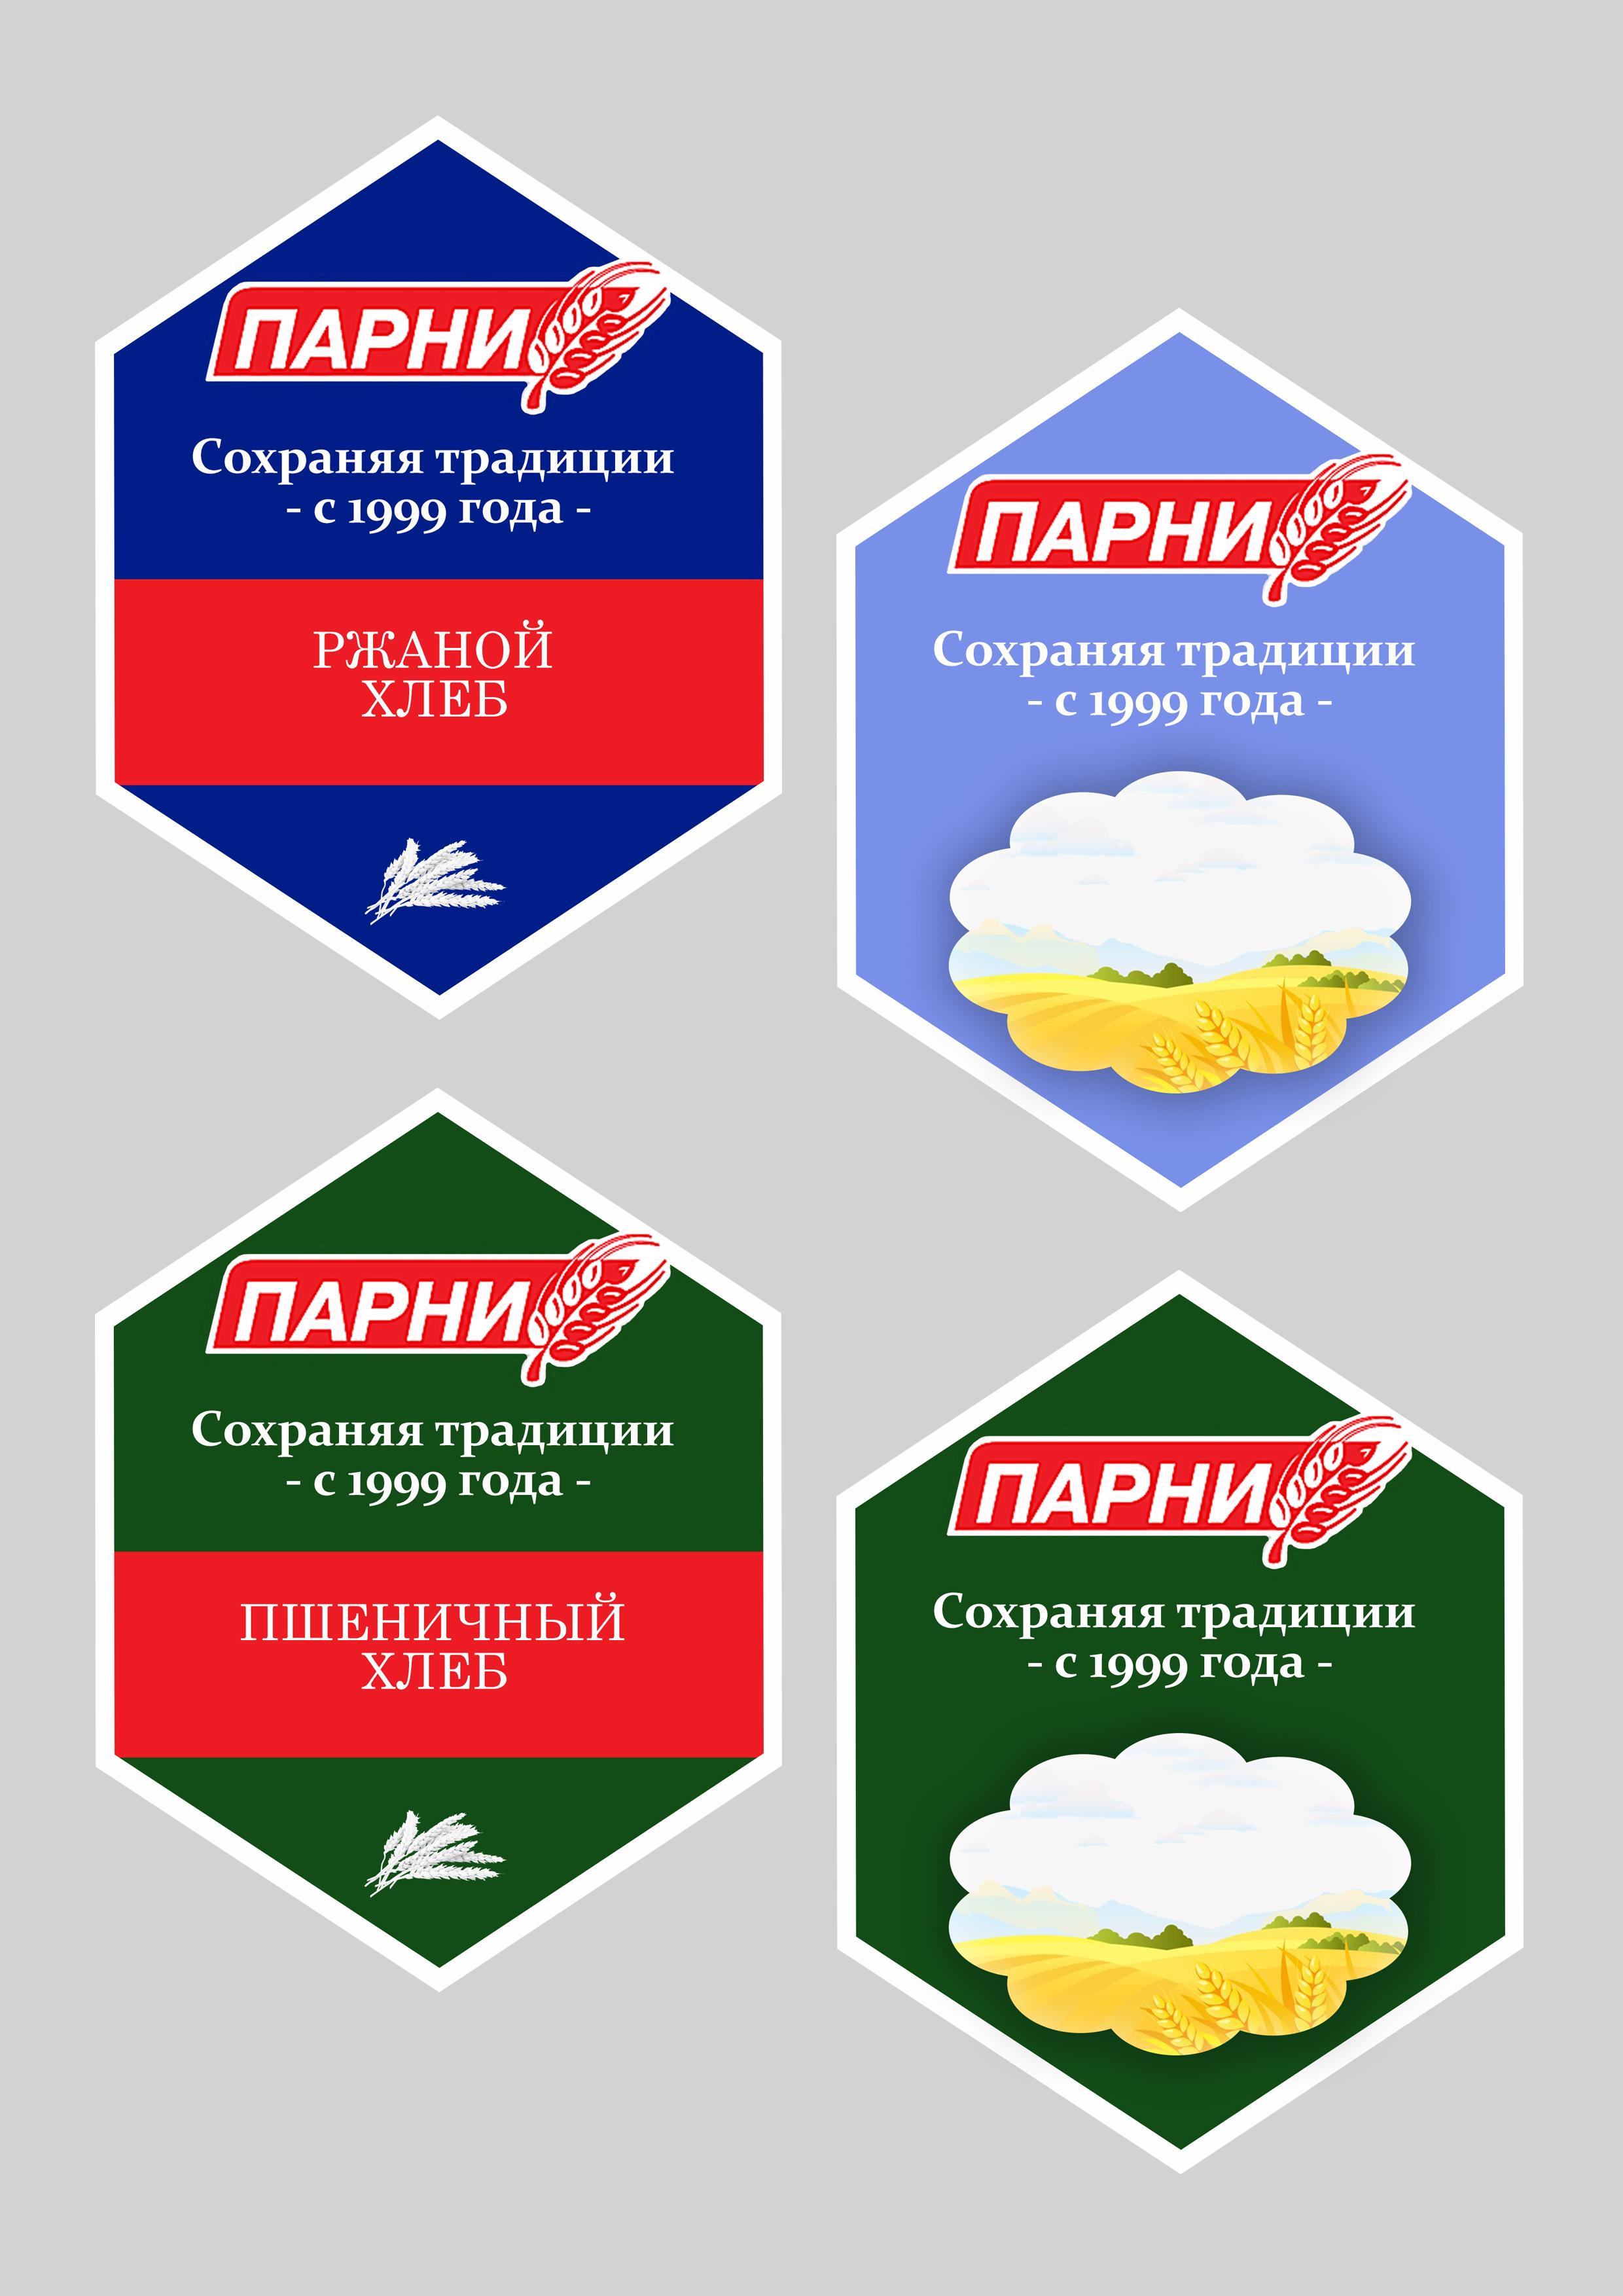 Дизайн упаковки для хлеба и батона фото f_4385d015588a816e.jpg